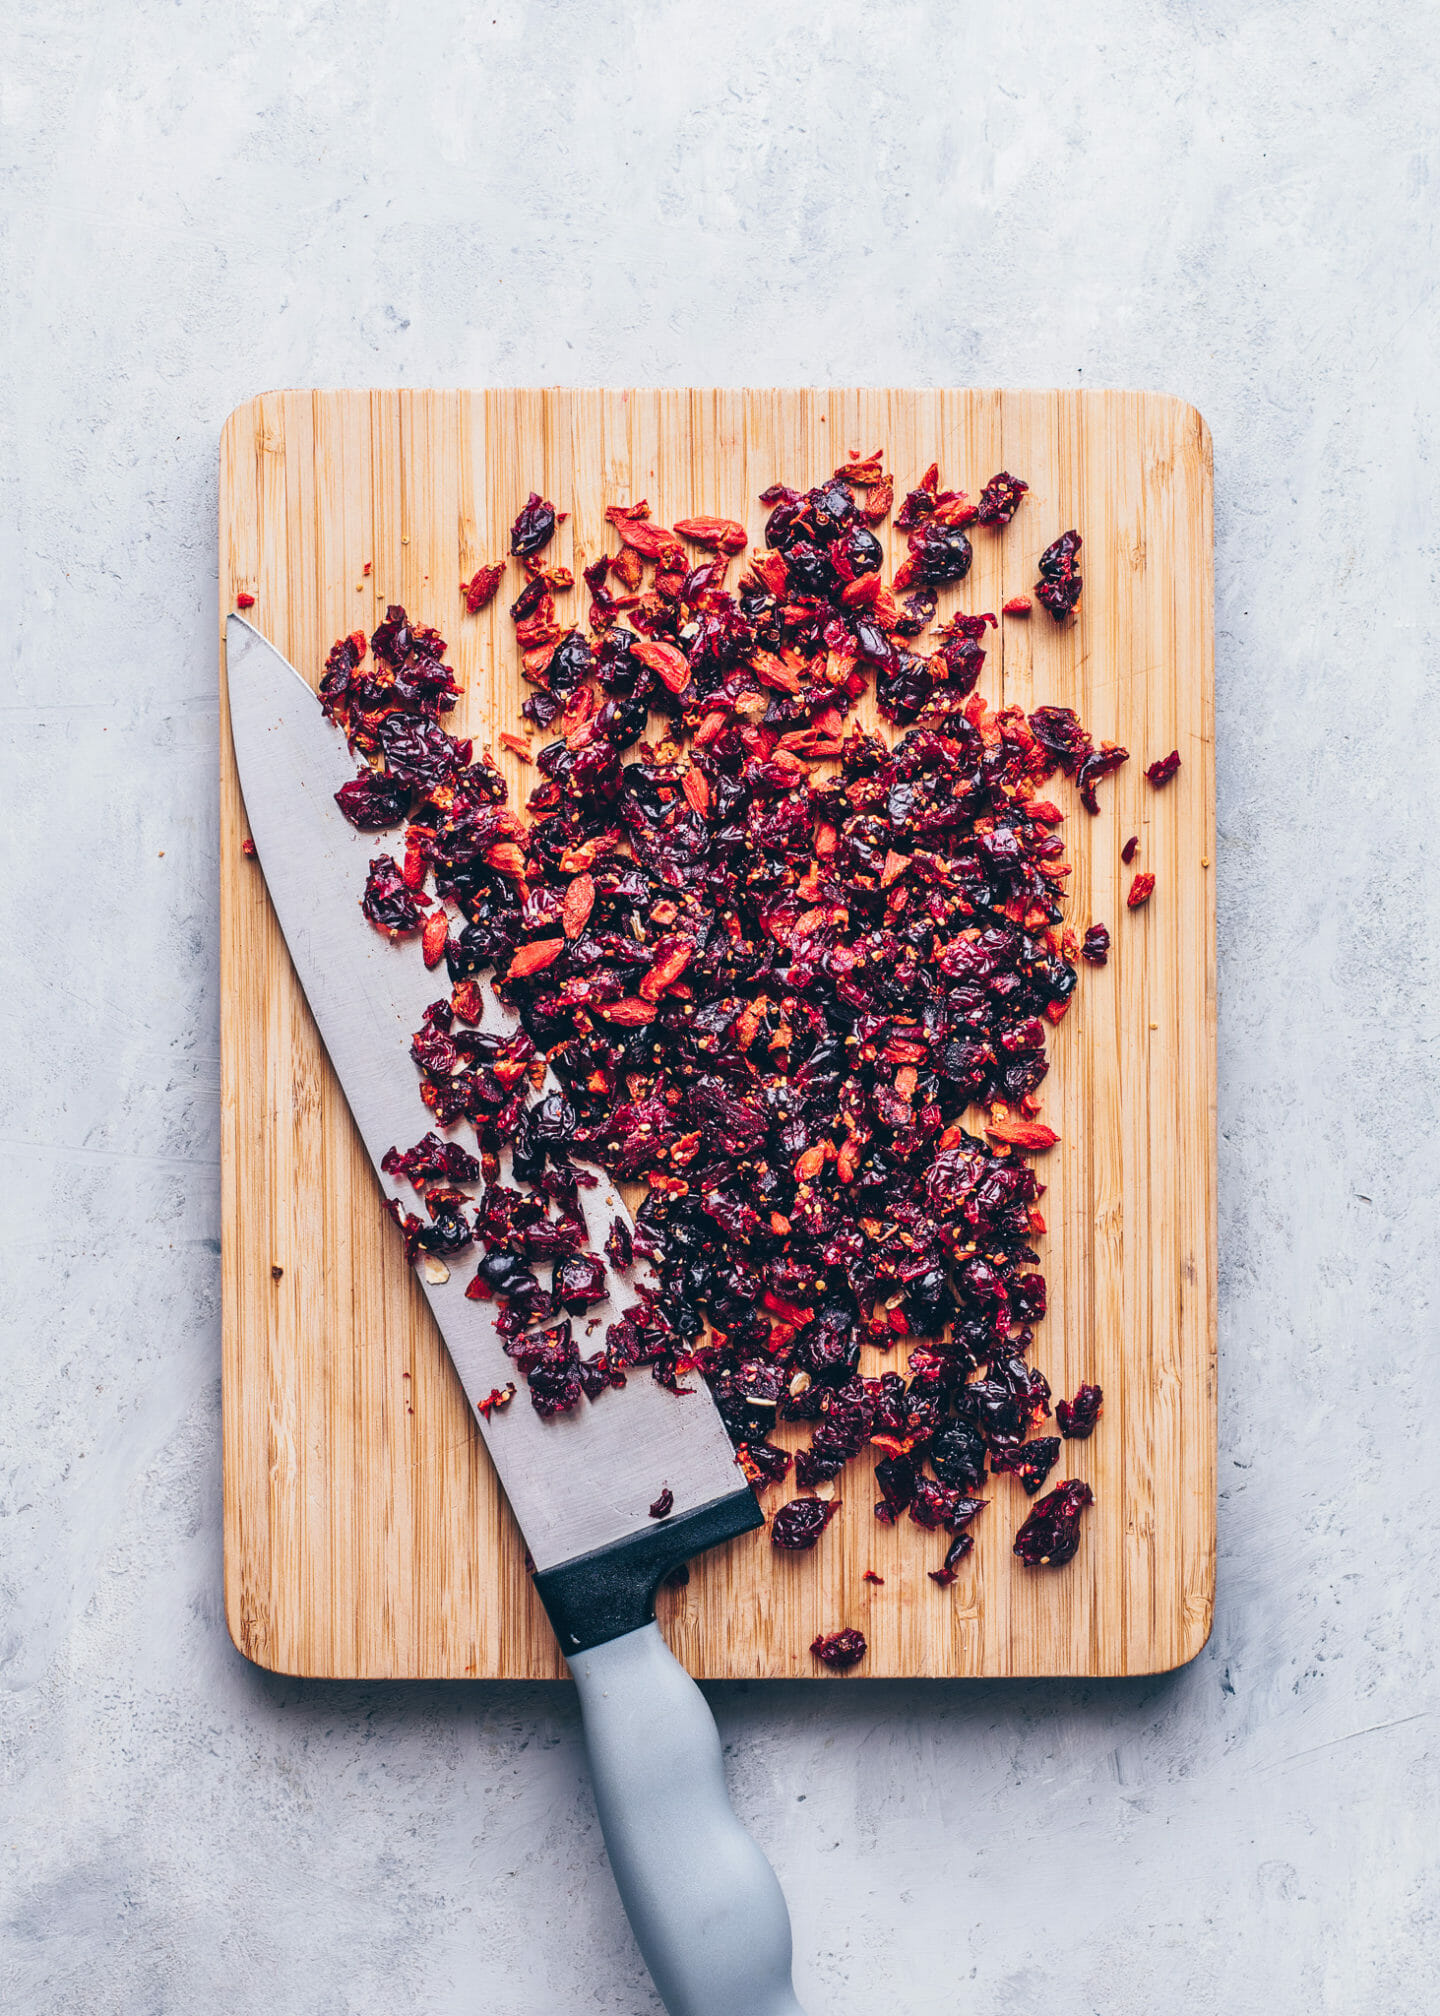 chopped cranberries and goji berries